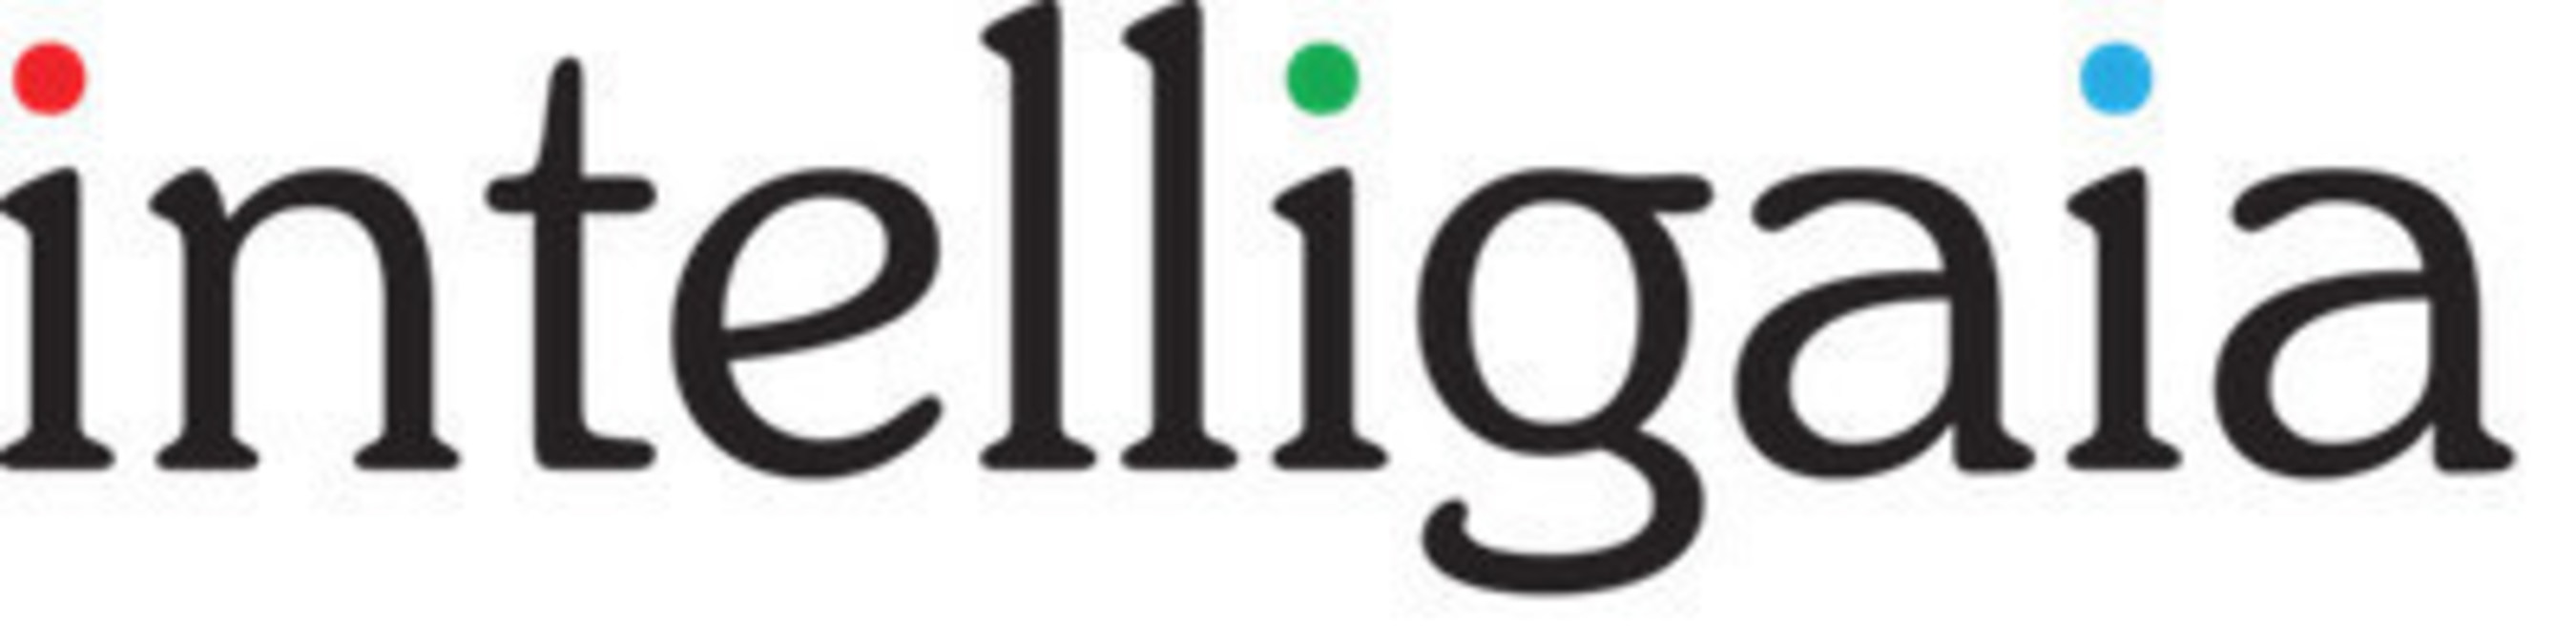 Intelligaia to Provide Valuable Design Consultation During Internet Summit